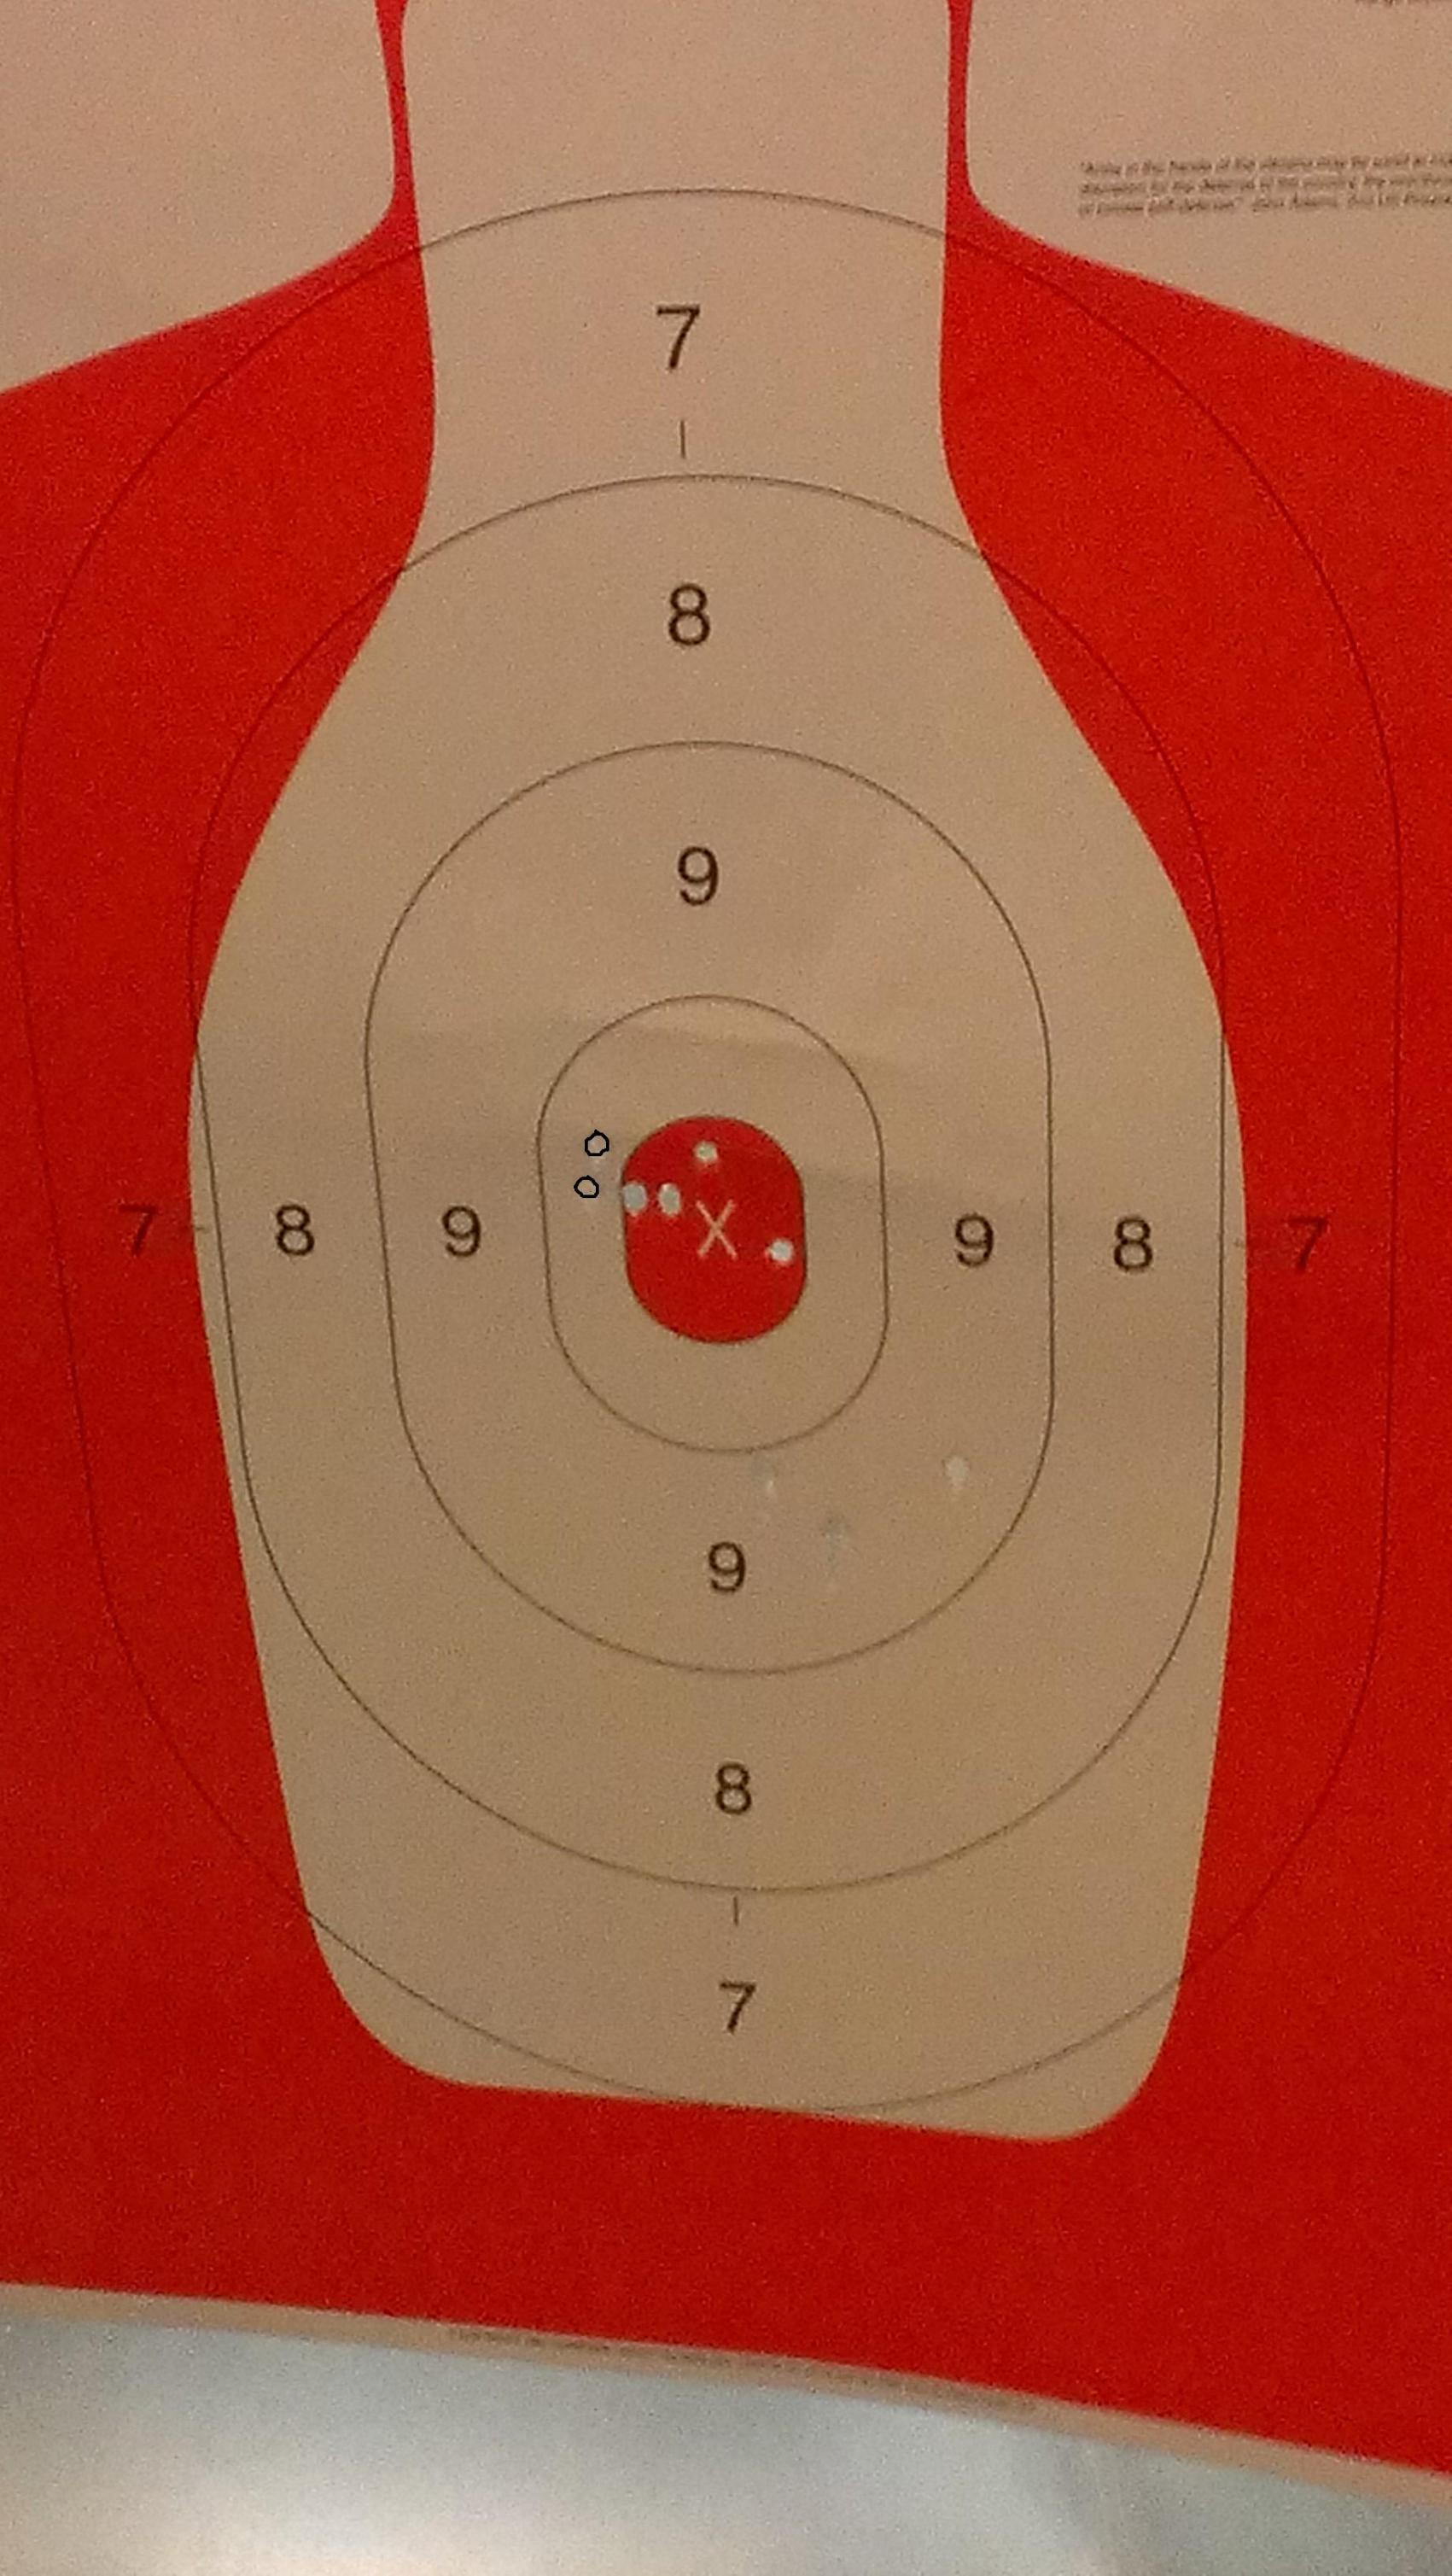 New Kimber Ultra Range Report with Rossi 357 Snub Magnum bonus report (pics too)-imag0098.jpg